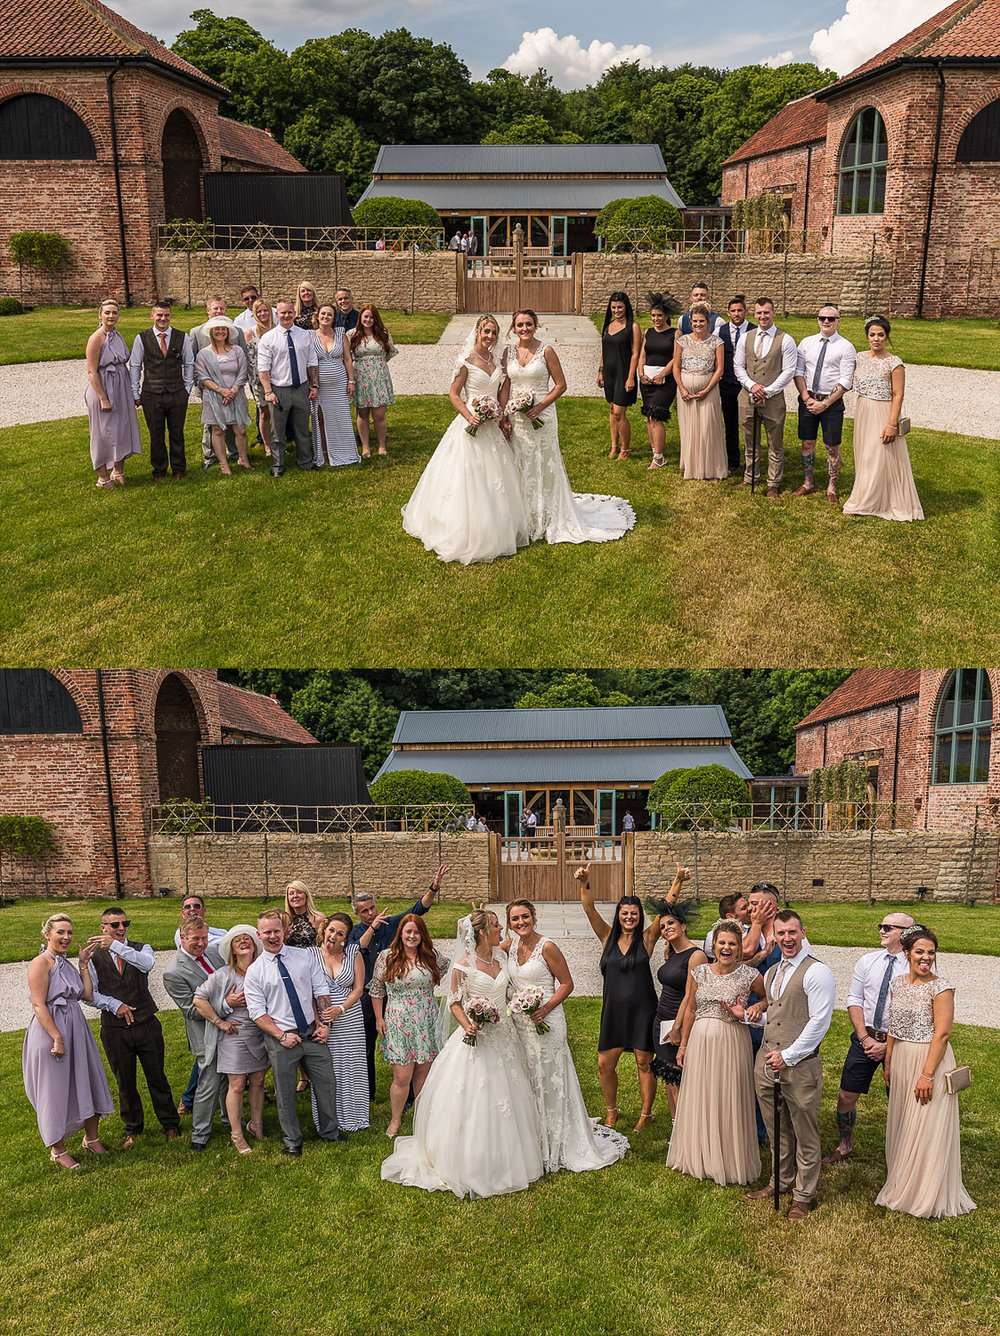 Fun lesbian wedding group photos